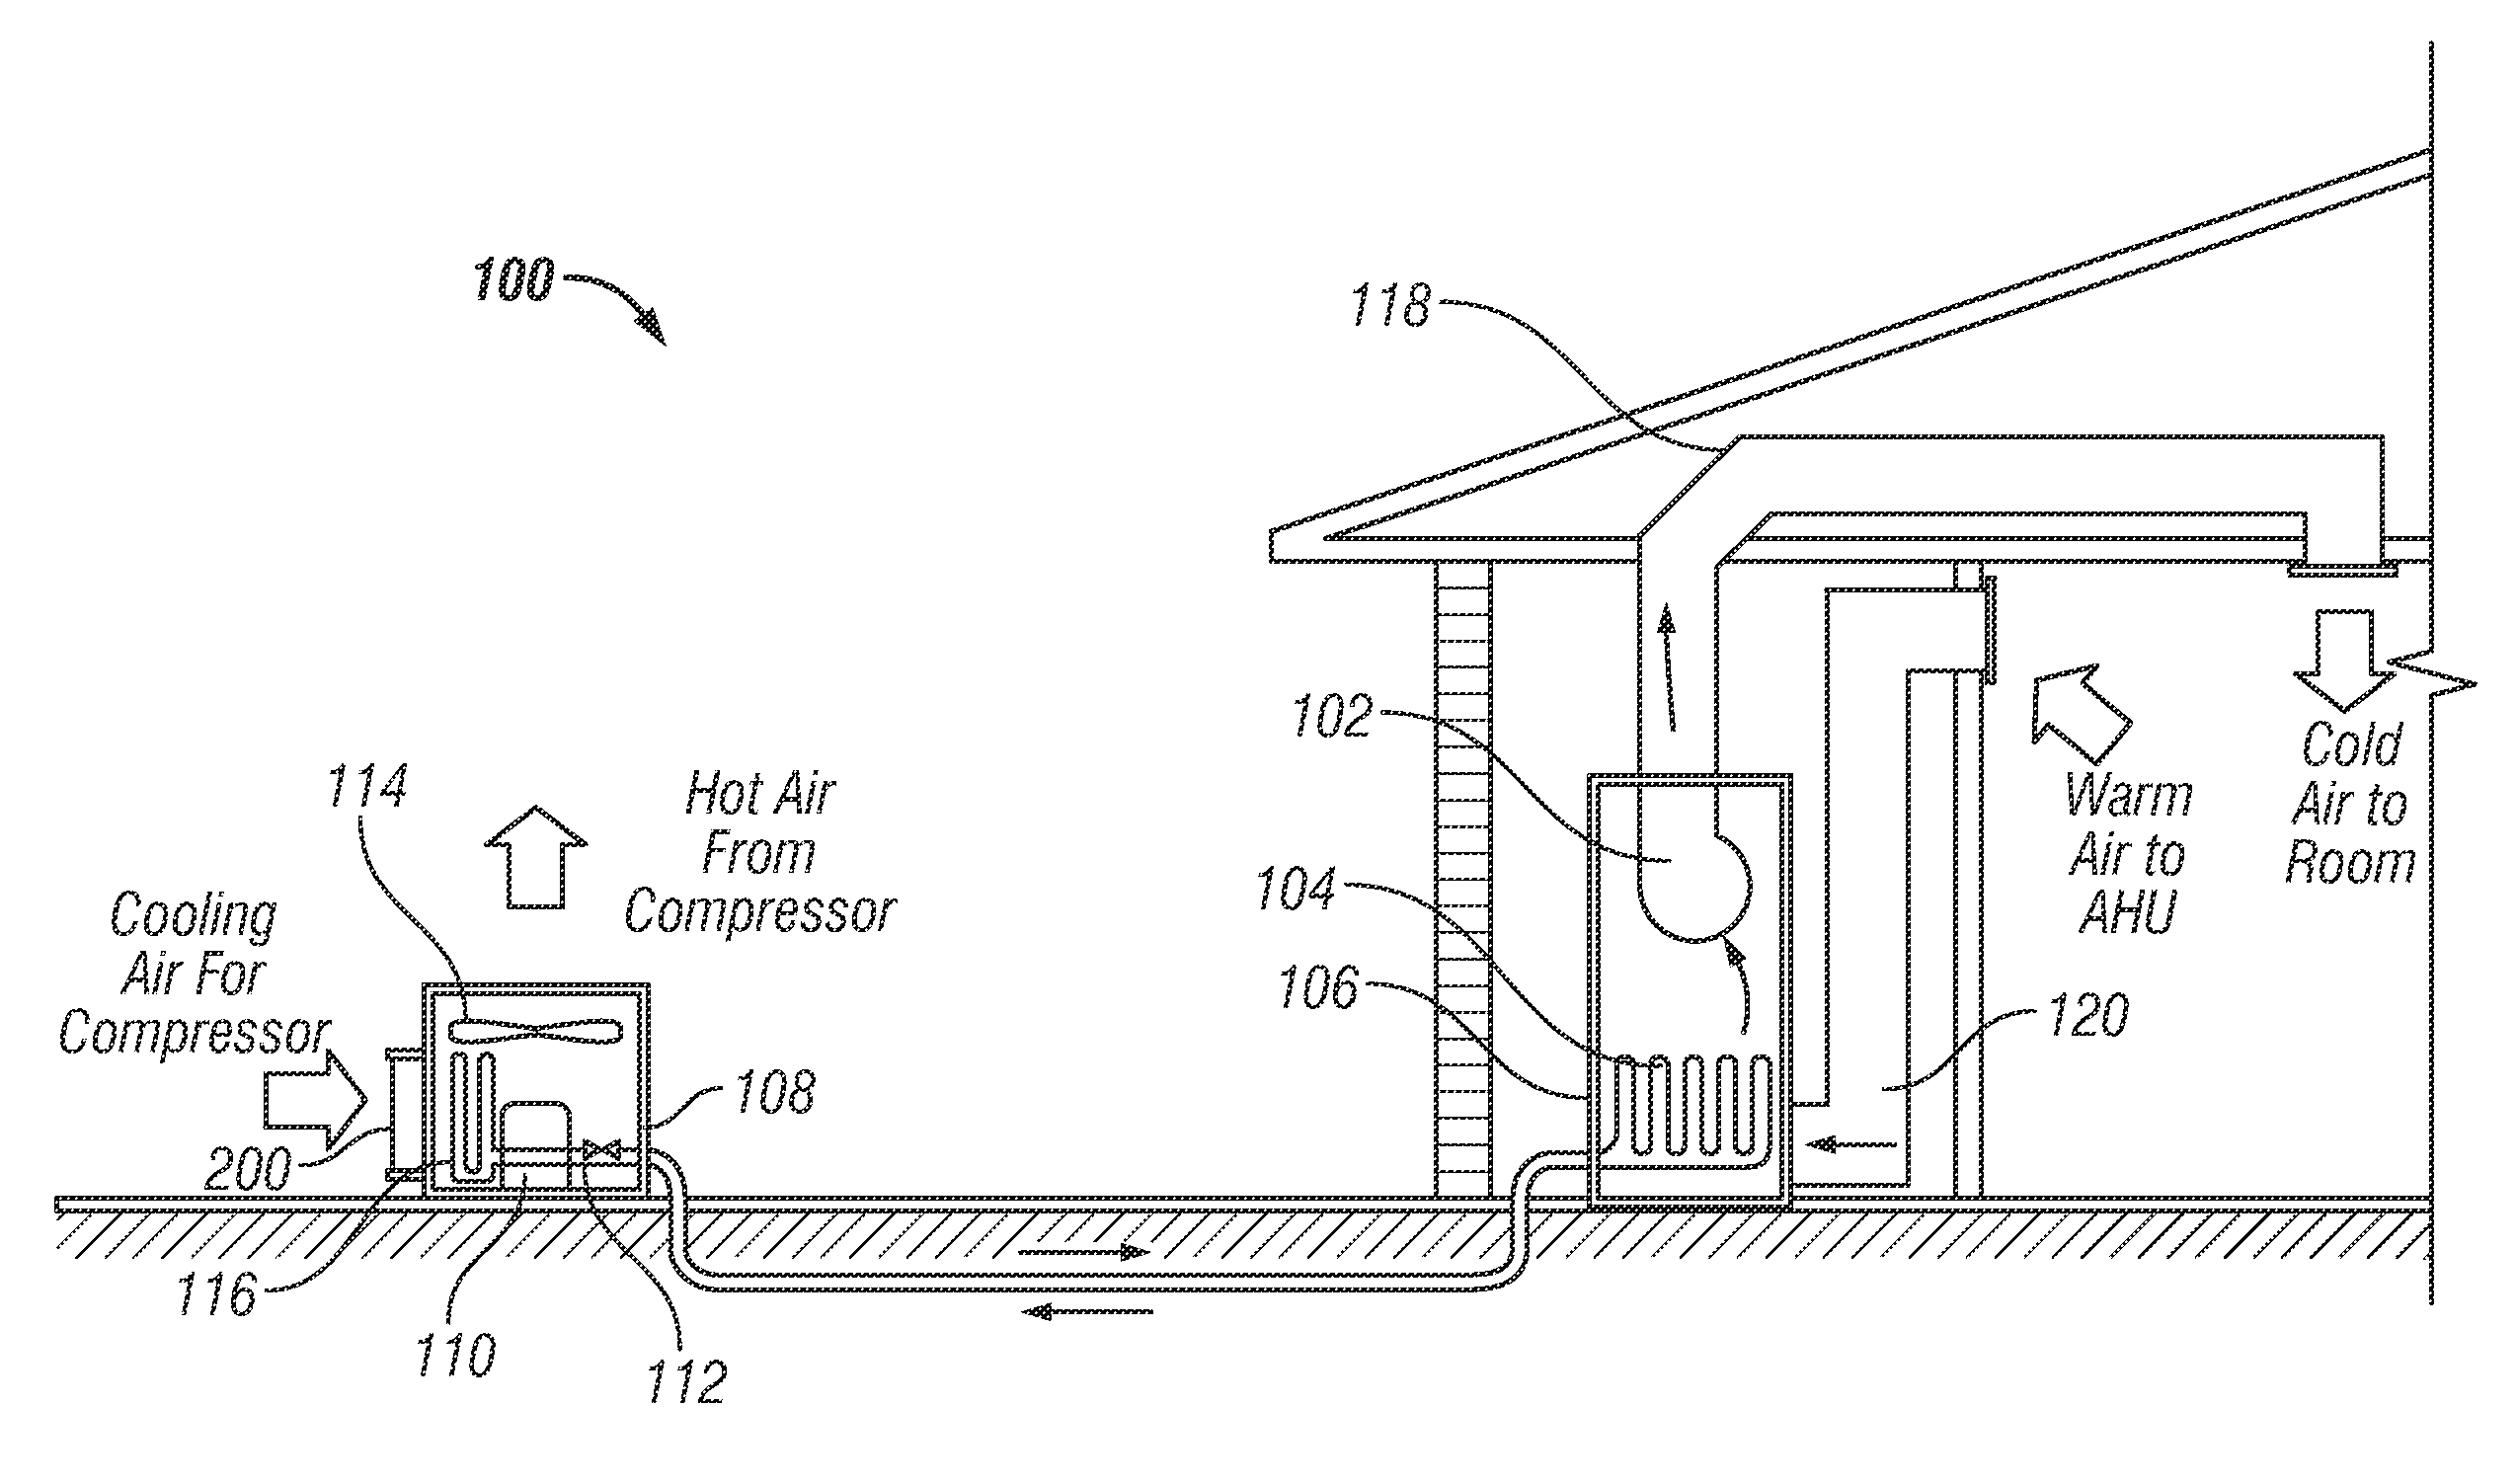 fan coil unit wiring diagram toyota mr2 mk1 fcu 18 images